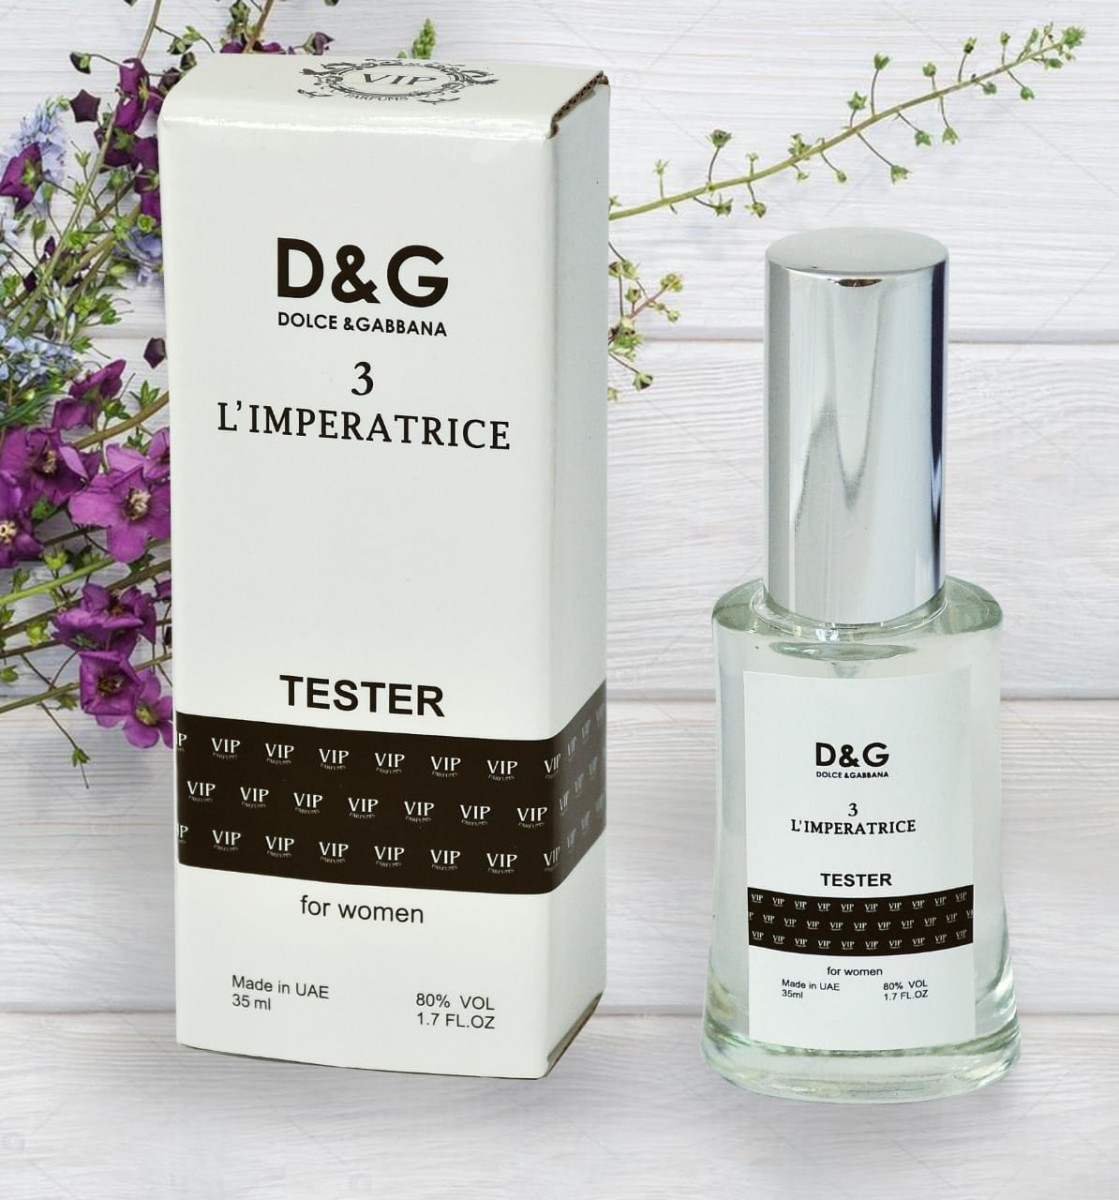 Dolce Gabbana L ' imperatrice - Tester 35ml